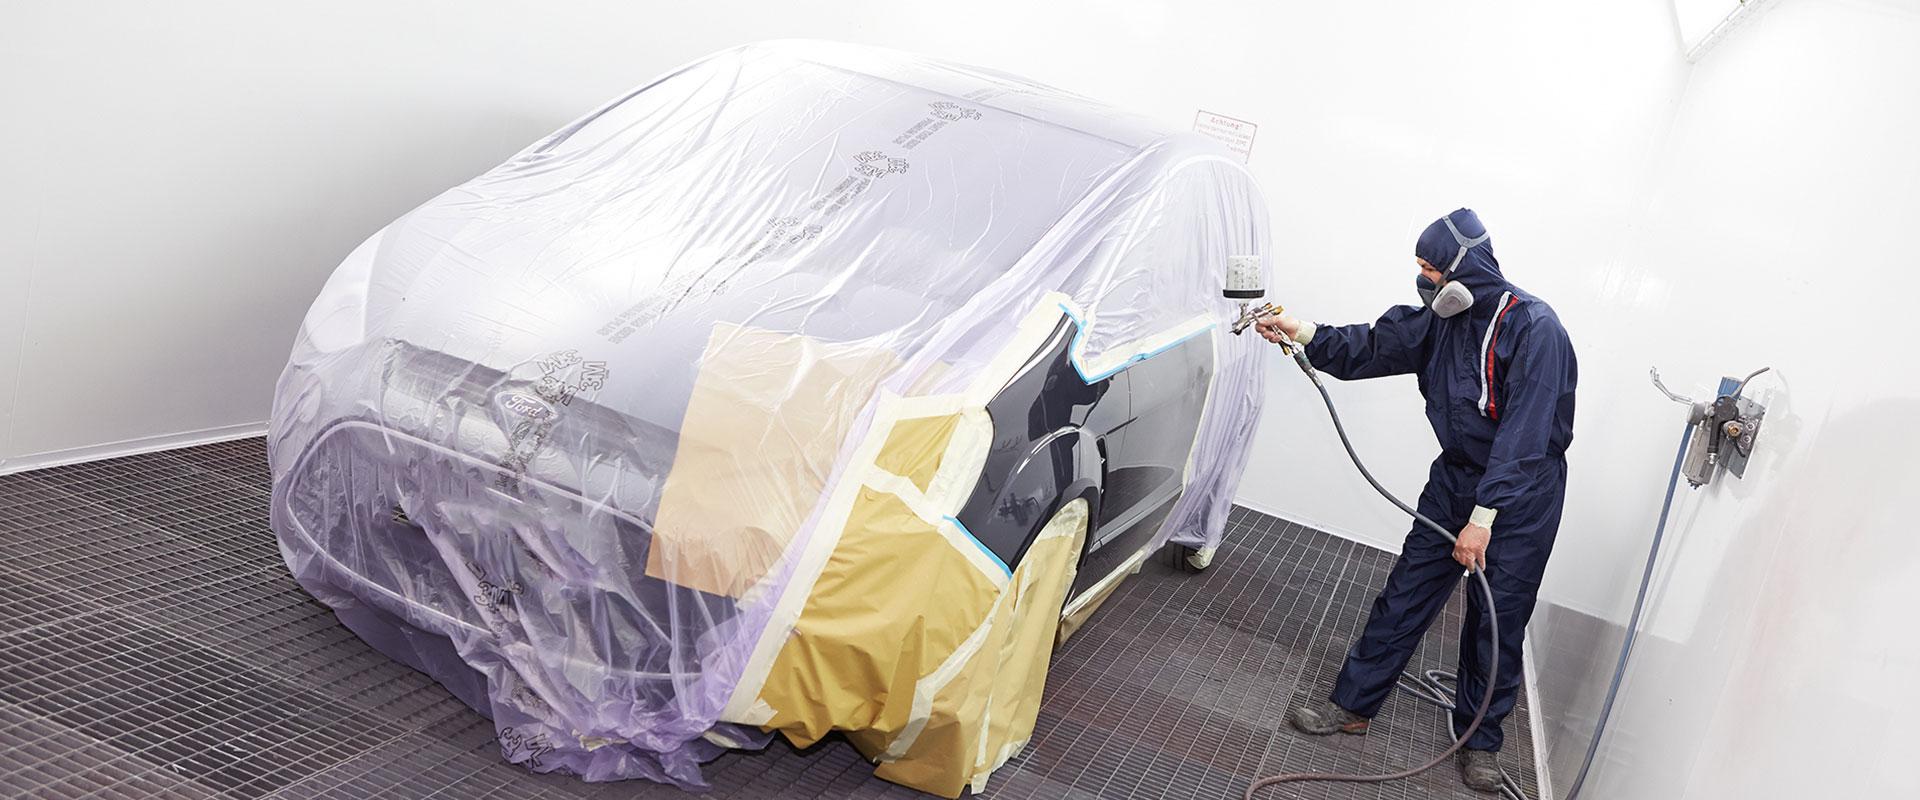 serviceleistungen lack karosserieinstandsetzung amzgruppe. Black Bedroom Furniture Sets. Home Design Ideas